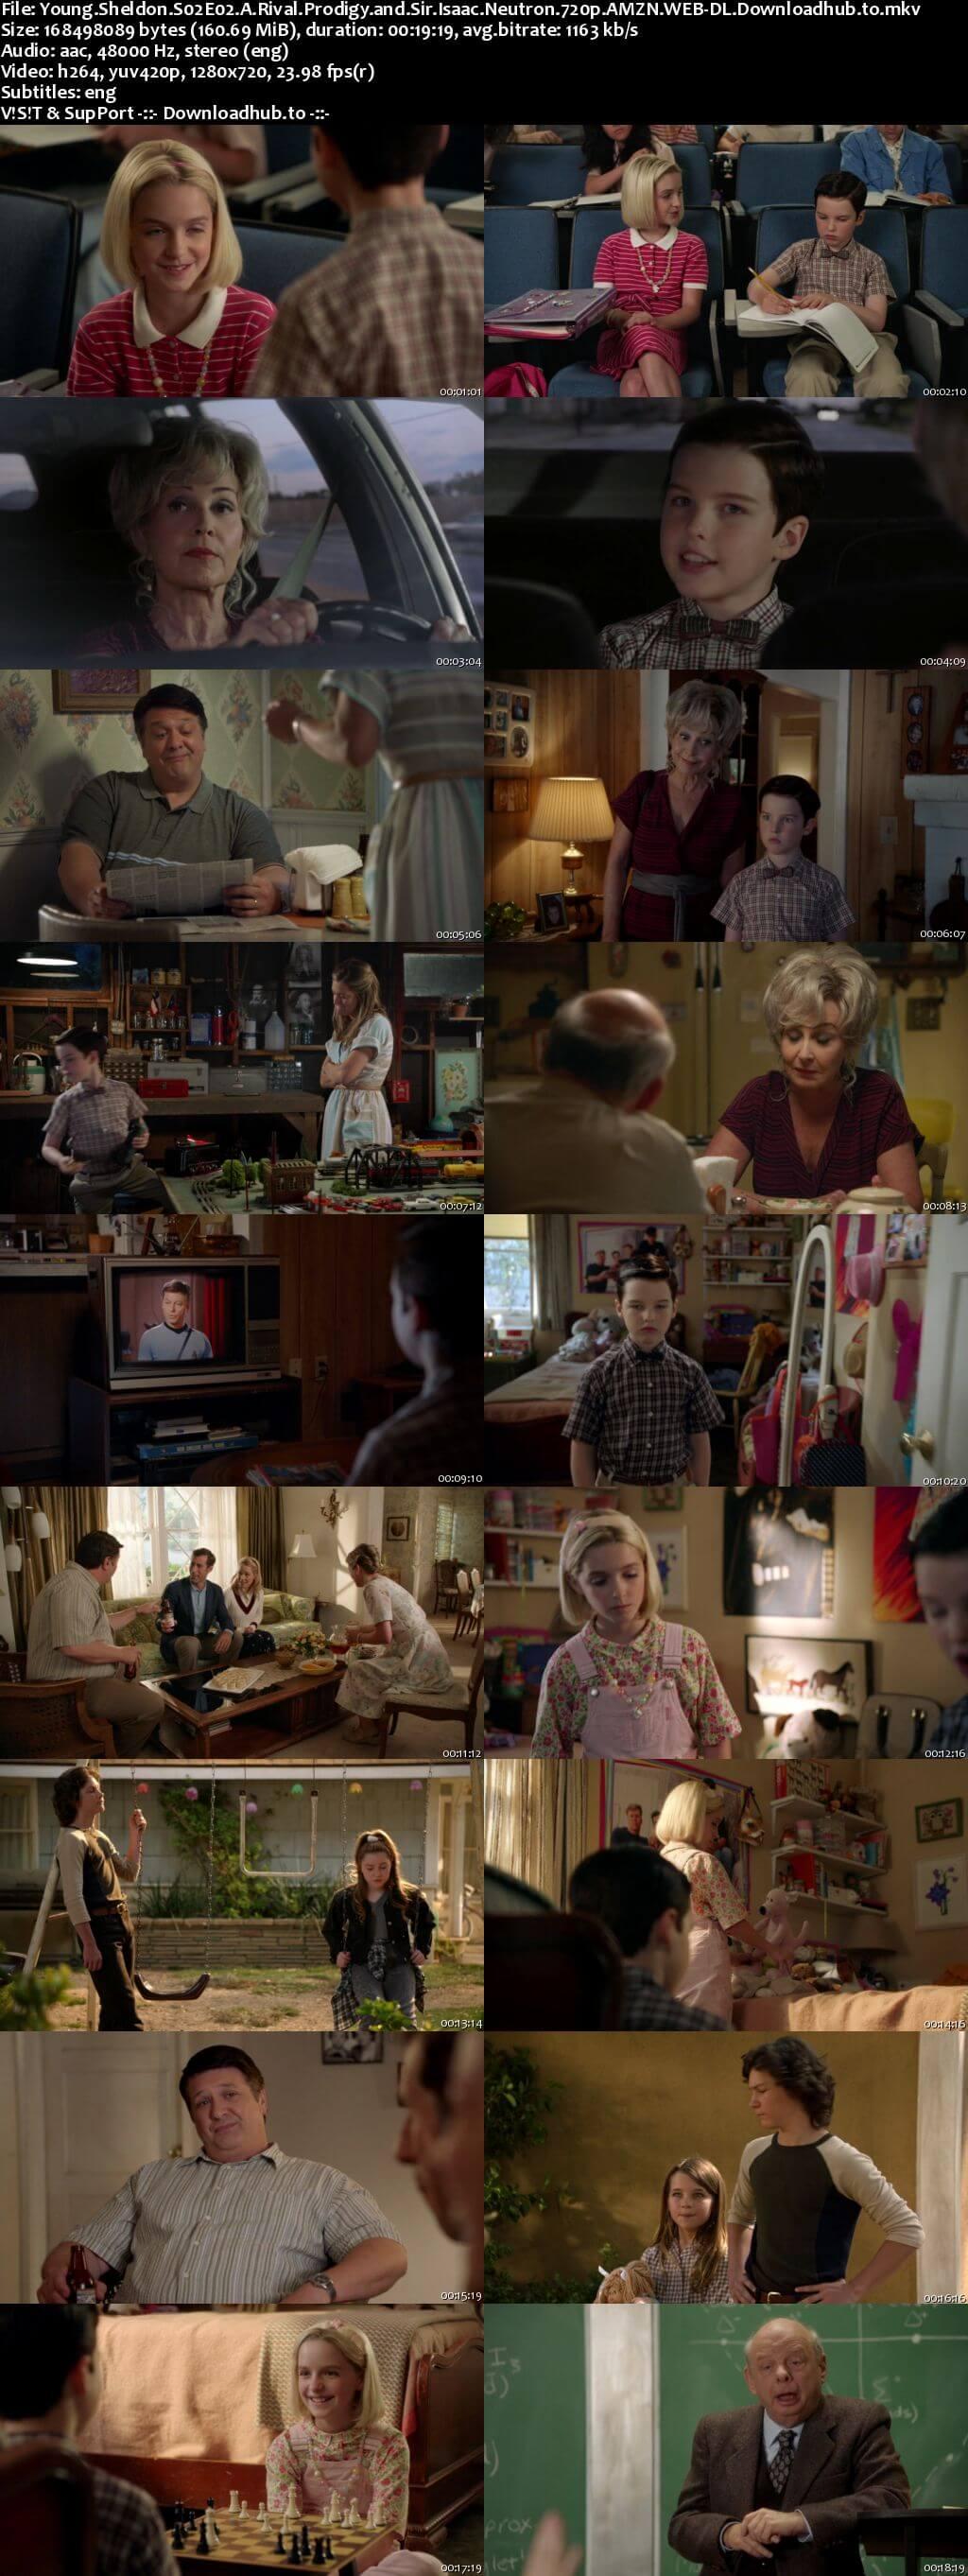 Young Sheldon S02E02 160MB AMZN WEB-DL 720p ESubs